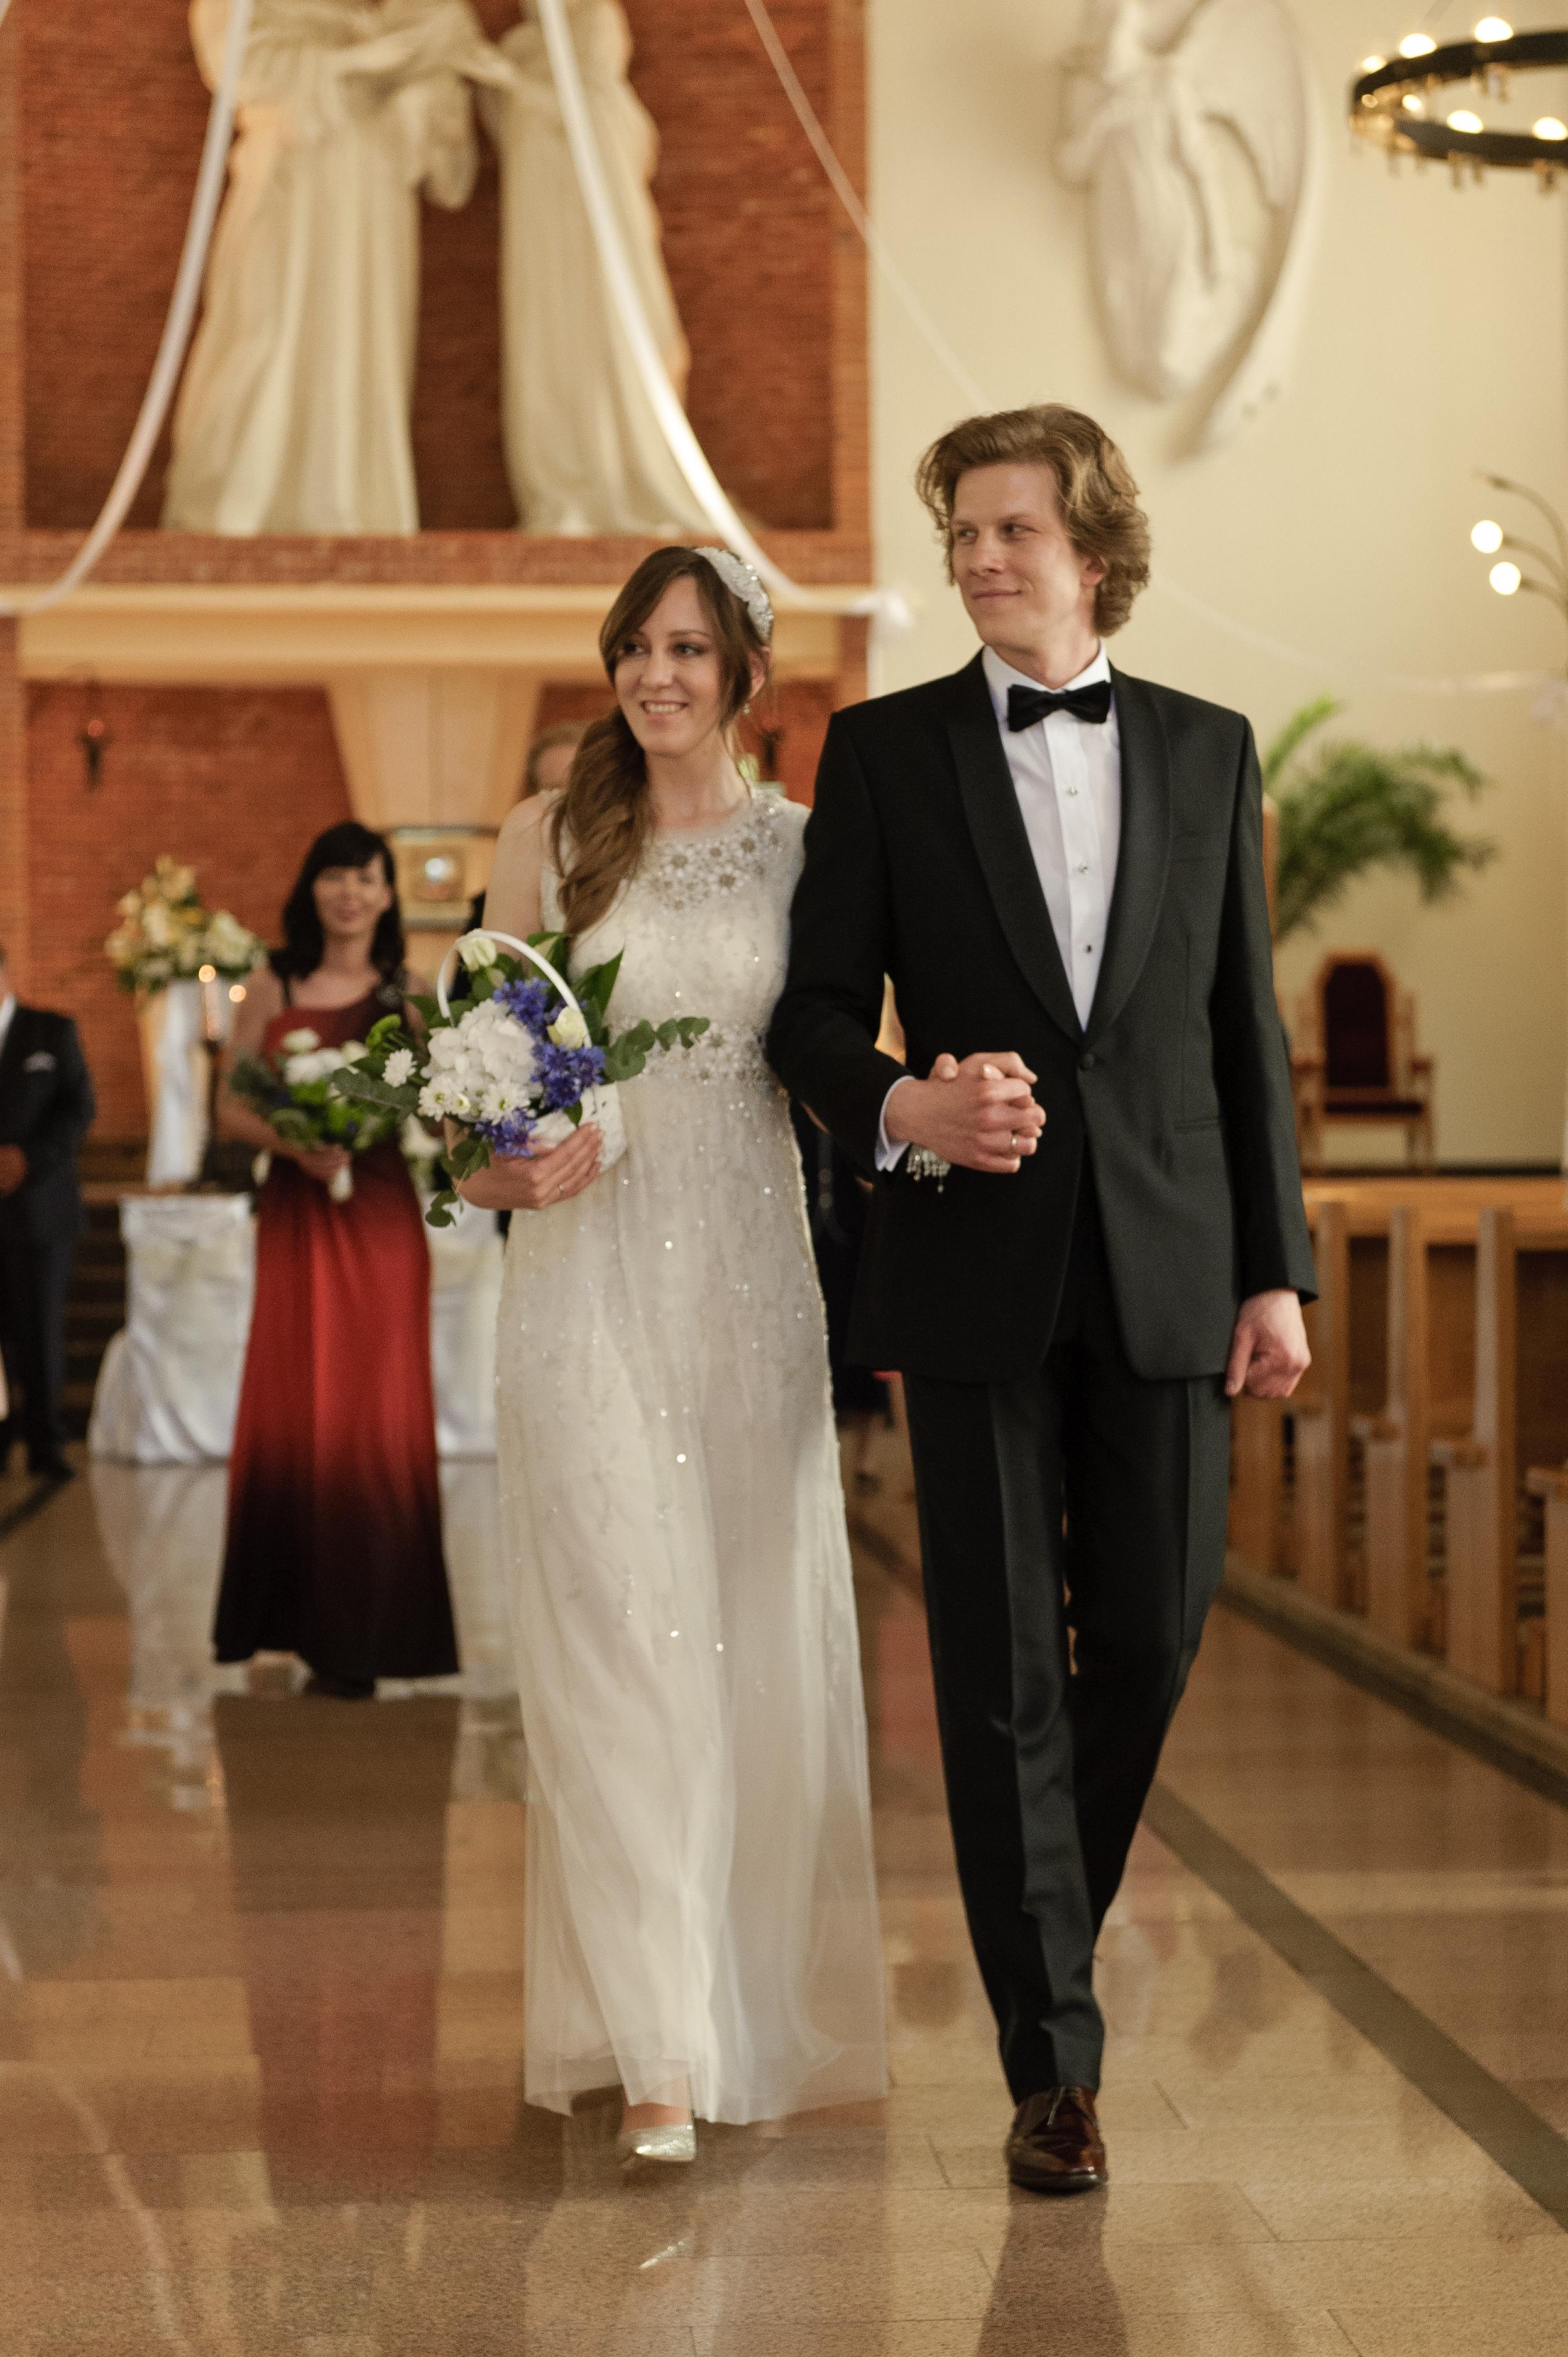 milena-dominic-black-wool-mohair-dinner-suit-shawl-collar-wedding-all-uk-made-bespoke.jpg